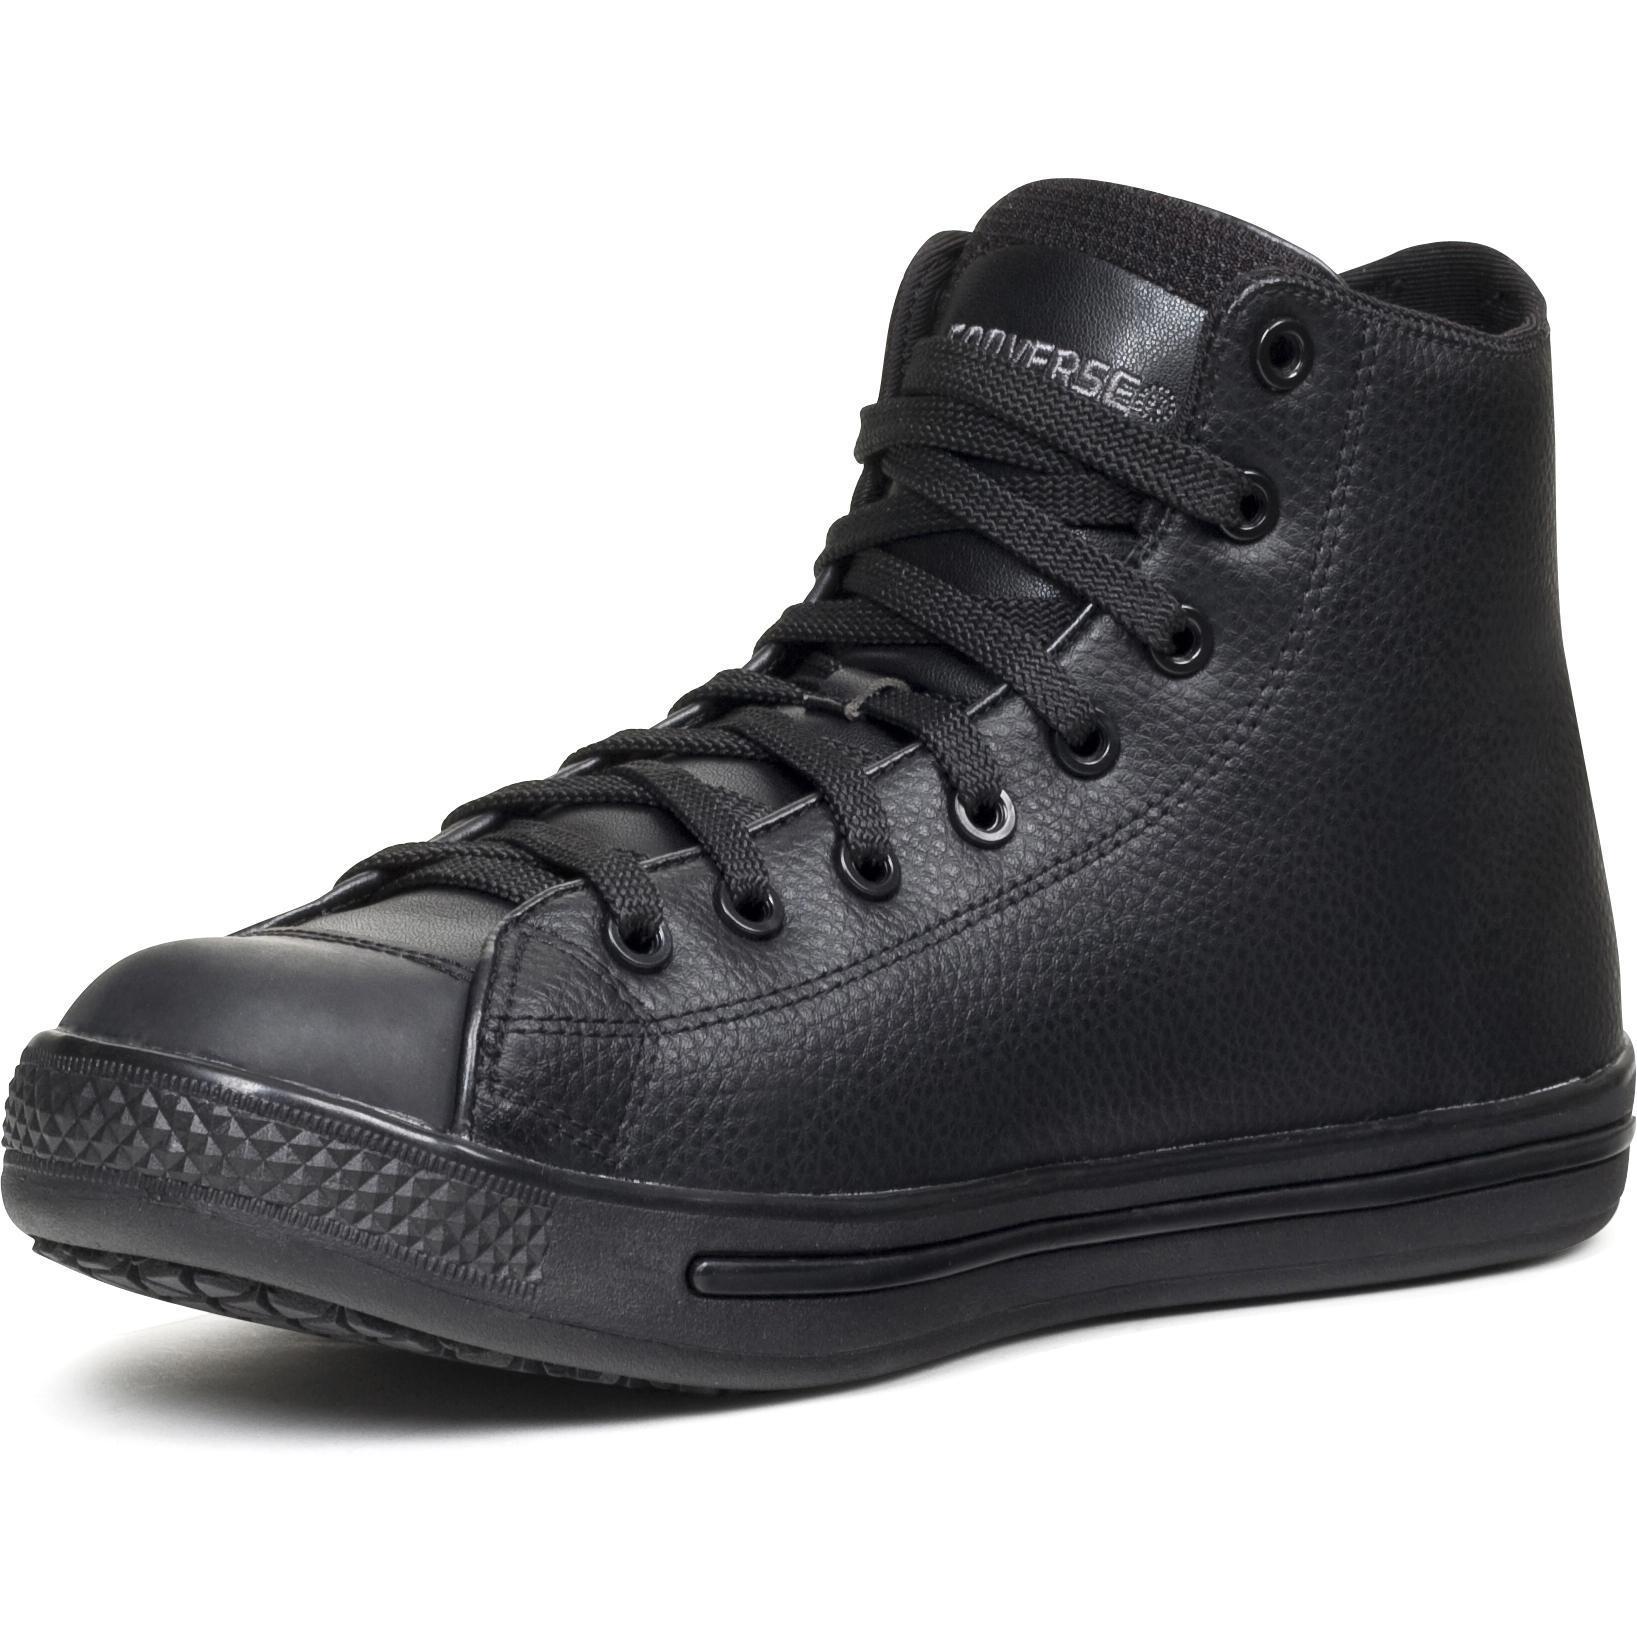 Converse Composite Safety Shoes